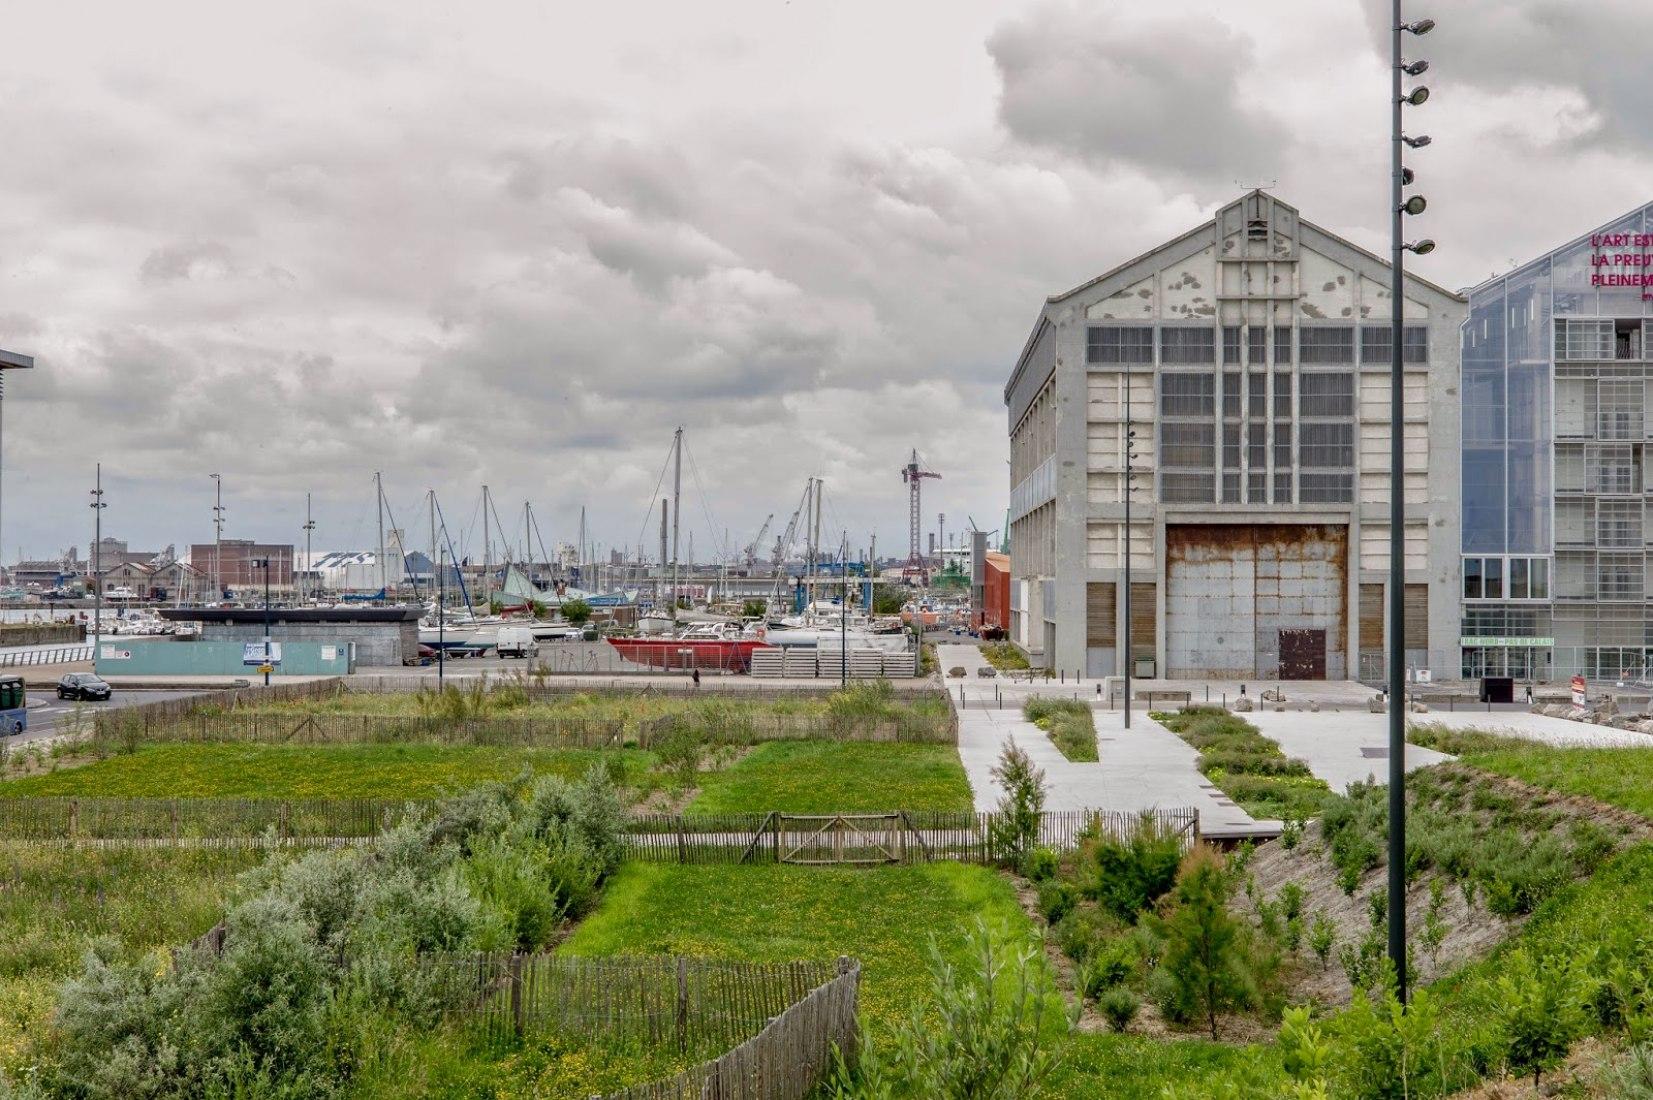 FRAC Nord-Pas de Calais by Lacaton & Vassal. Images from